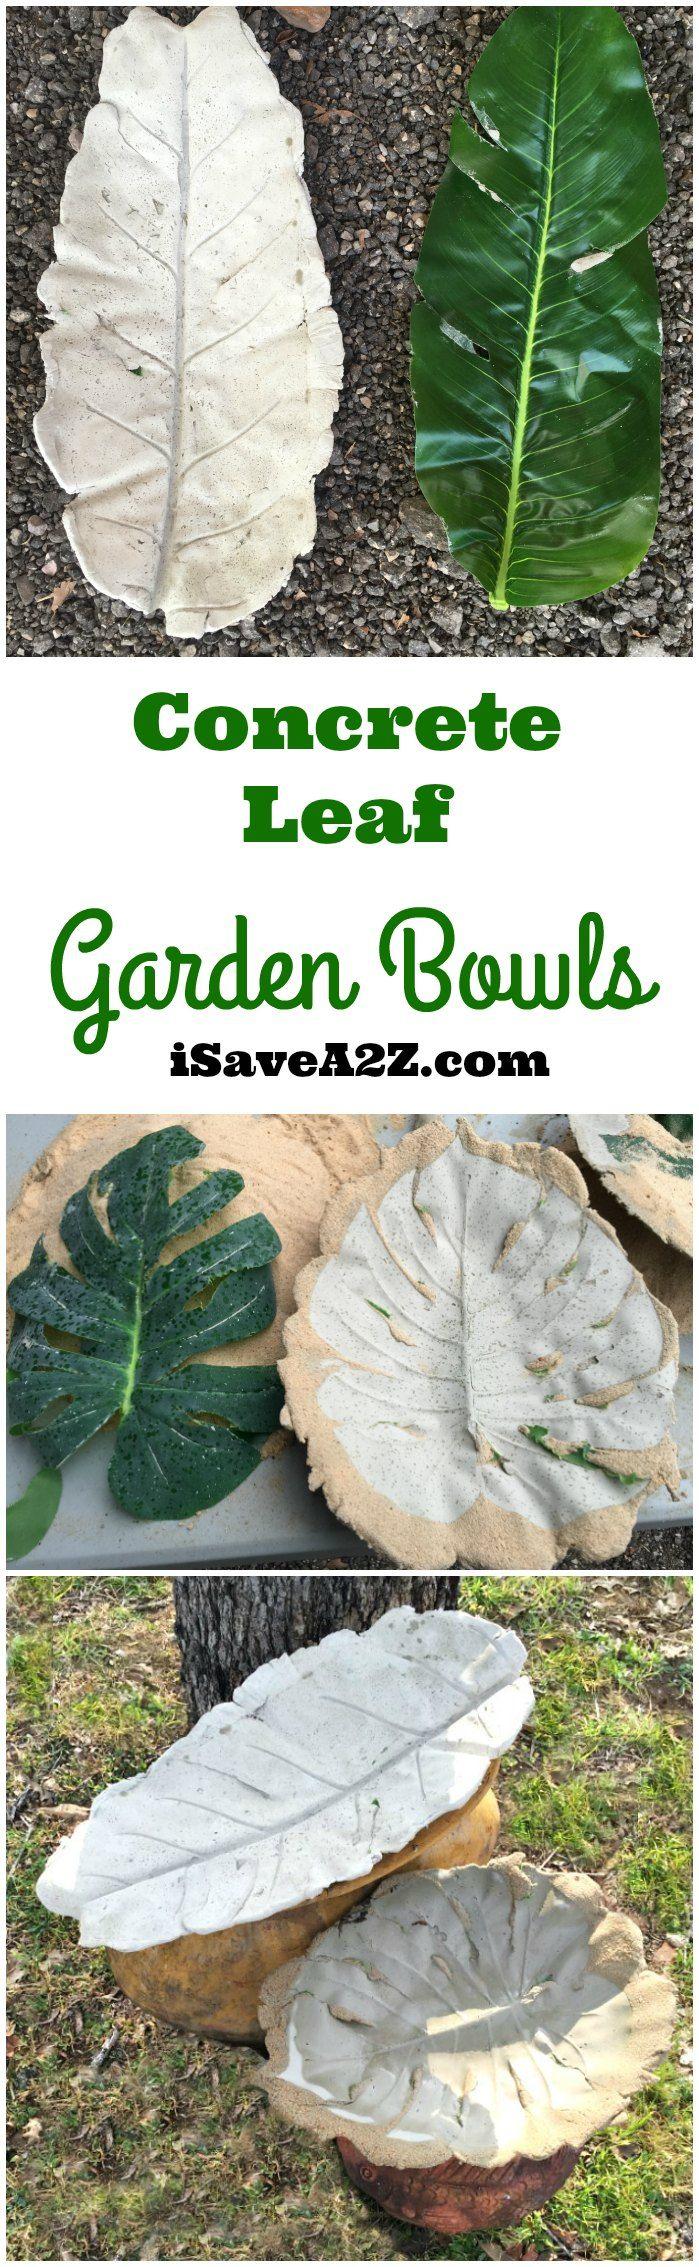 DIY Concrete Leaf Garden Bowl - iSaveA2Z.com